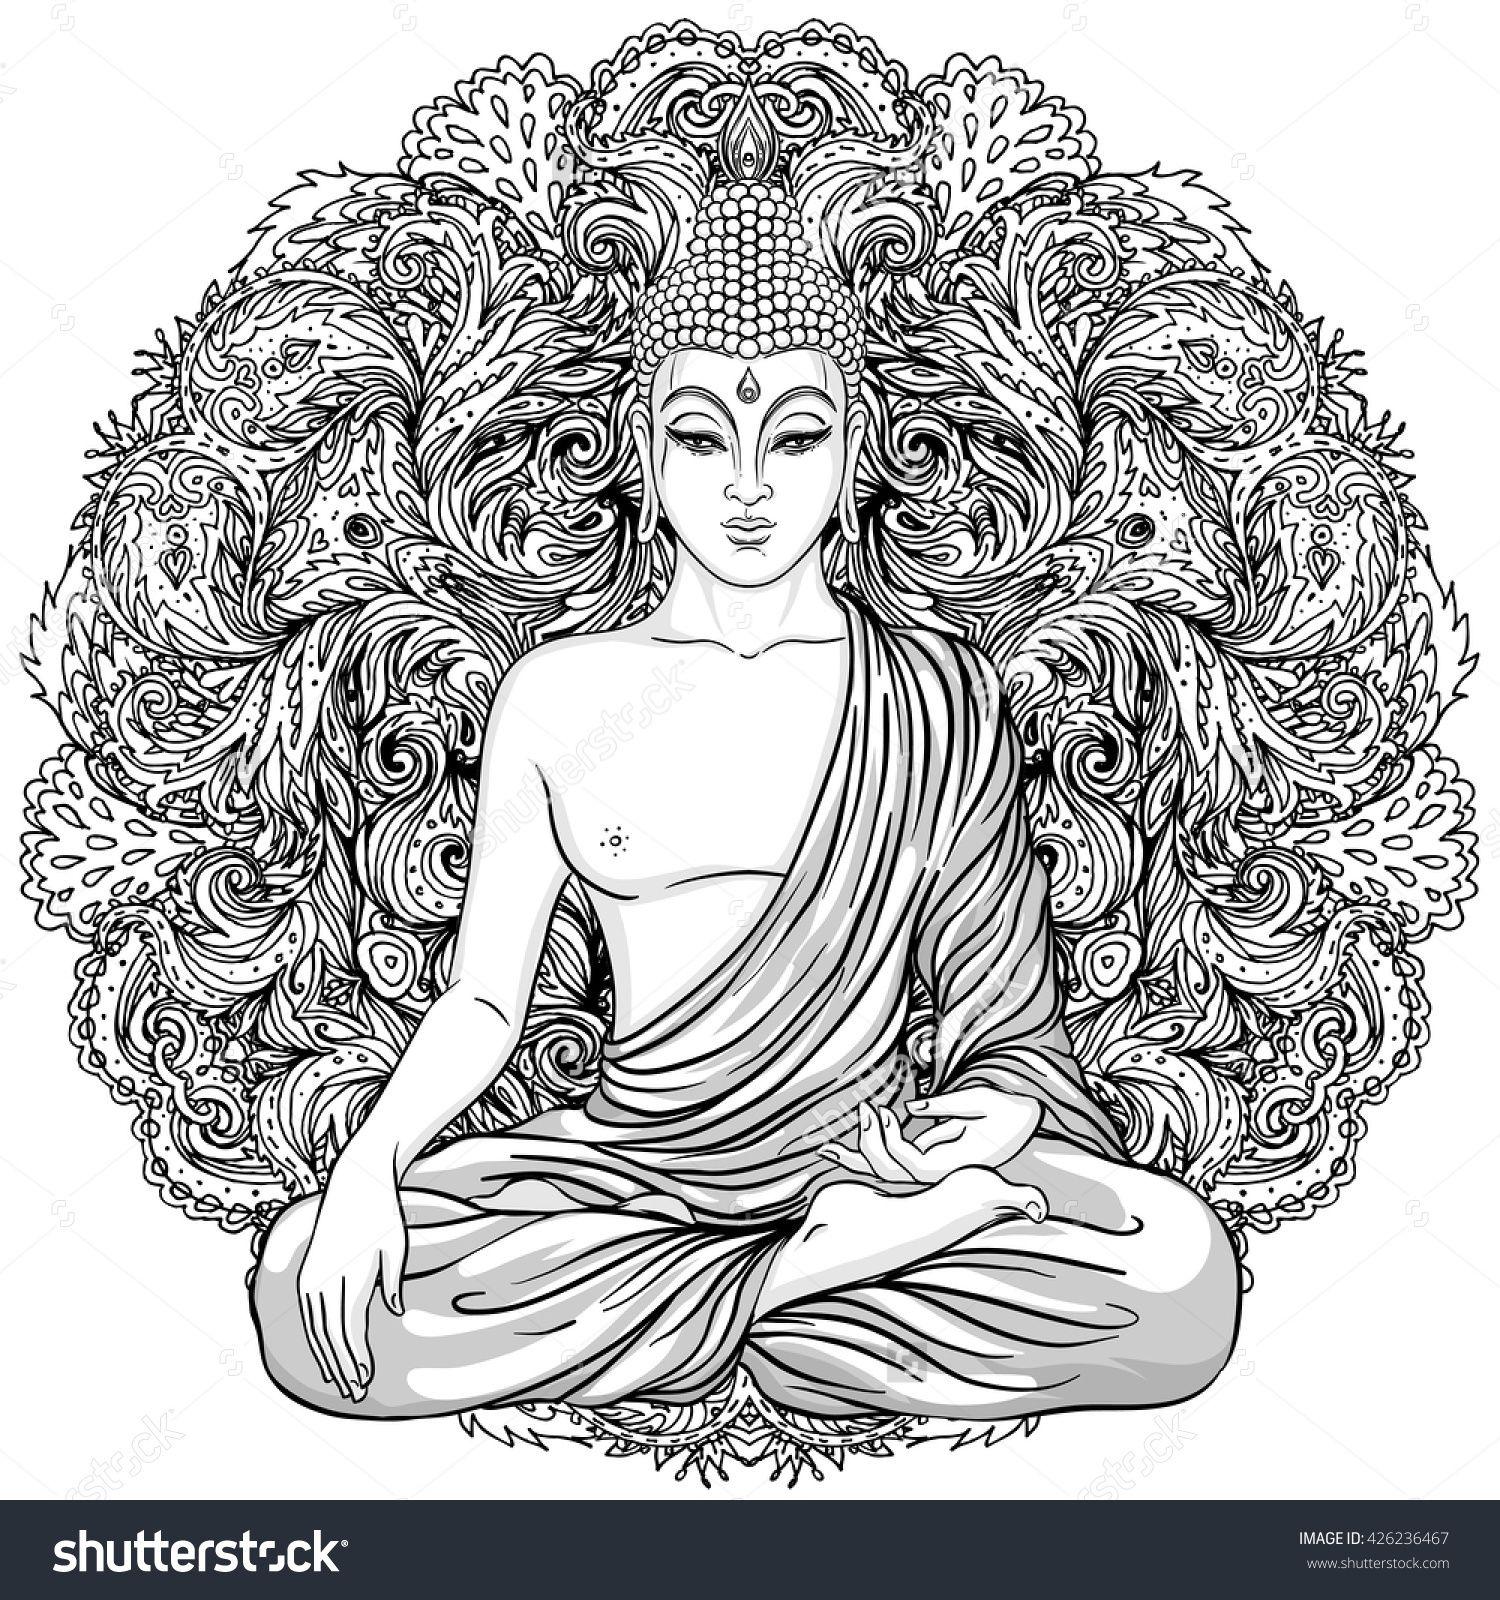 stock-vector-sitting-buddha-over-ornate-mandala-round-pattern-esoteric-vintage-vector-illustration-indian-426236467.jpg (1500×1600)